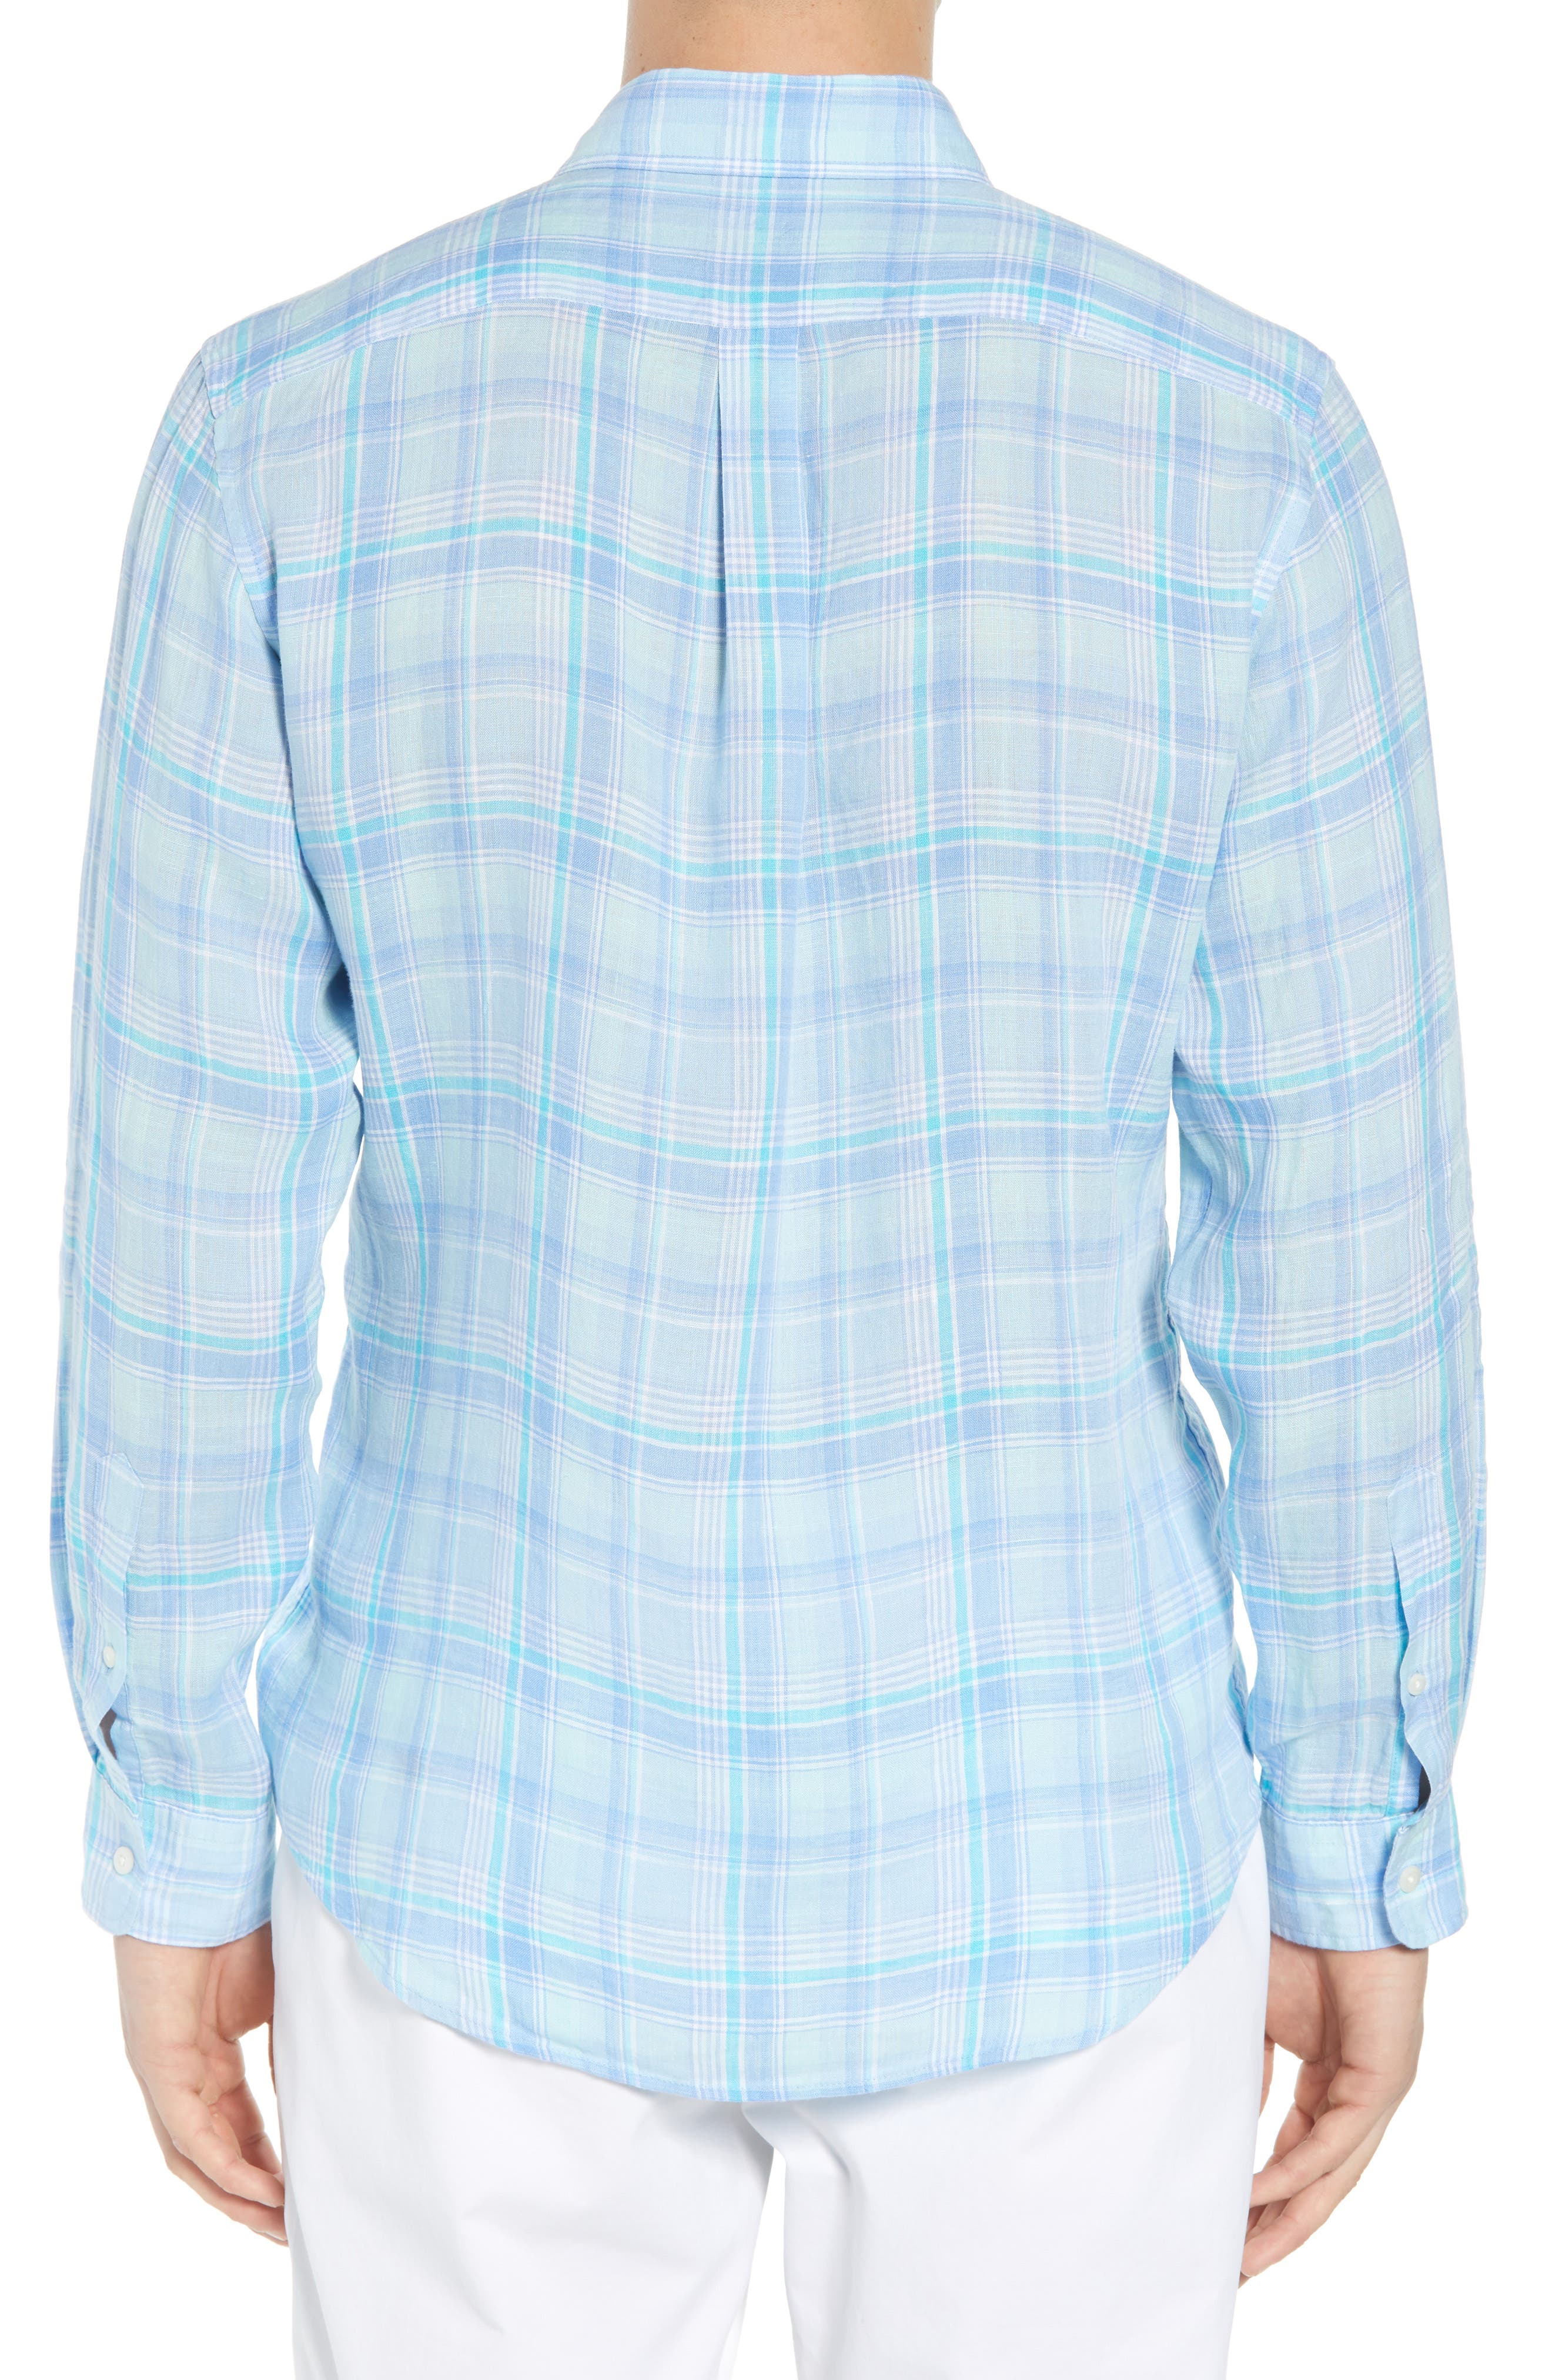 Moore's Island Classic Fit Plaid Sport Shirt,                             Alternate thumbnail 3, color,                             Baja Blue